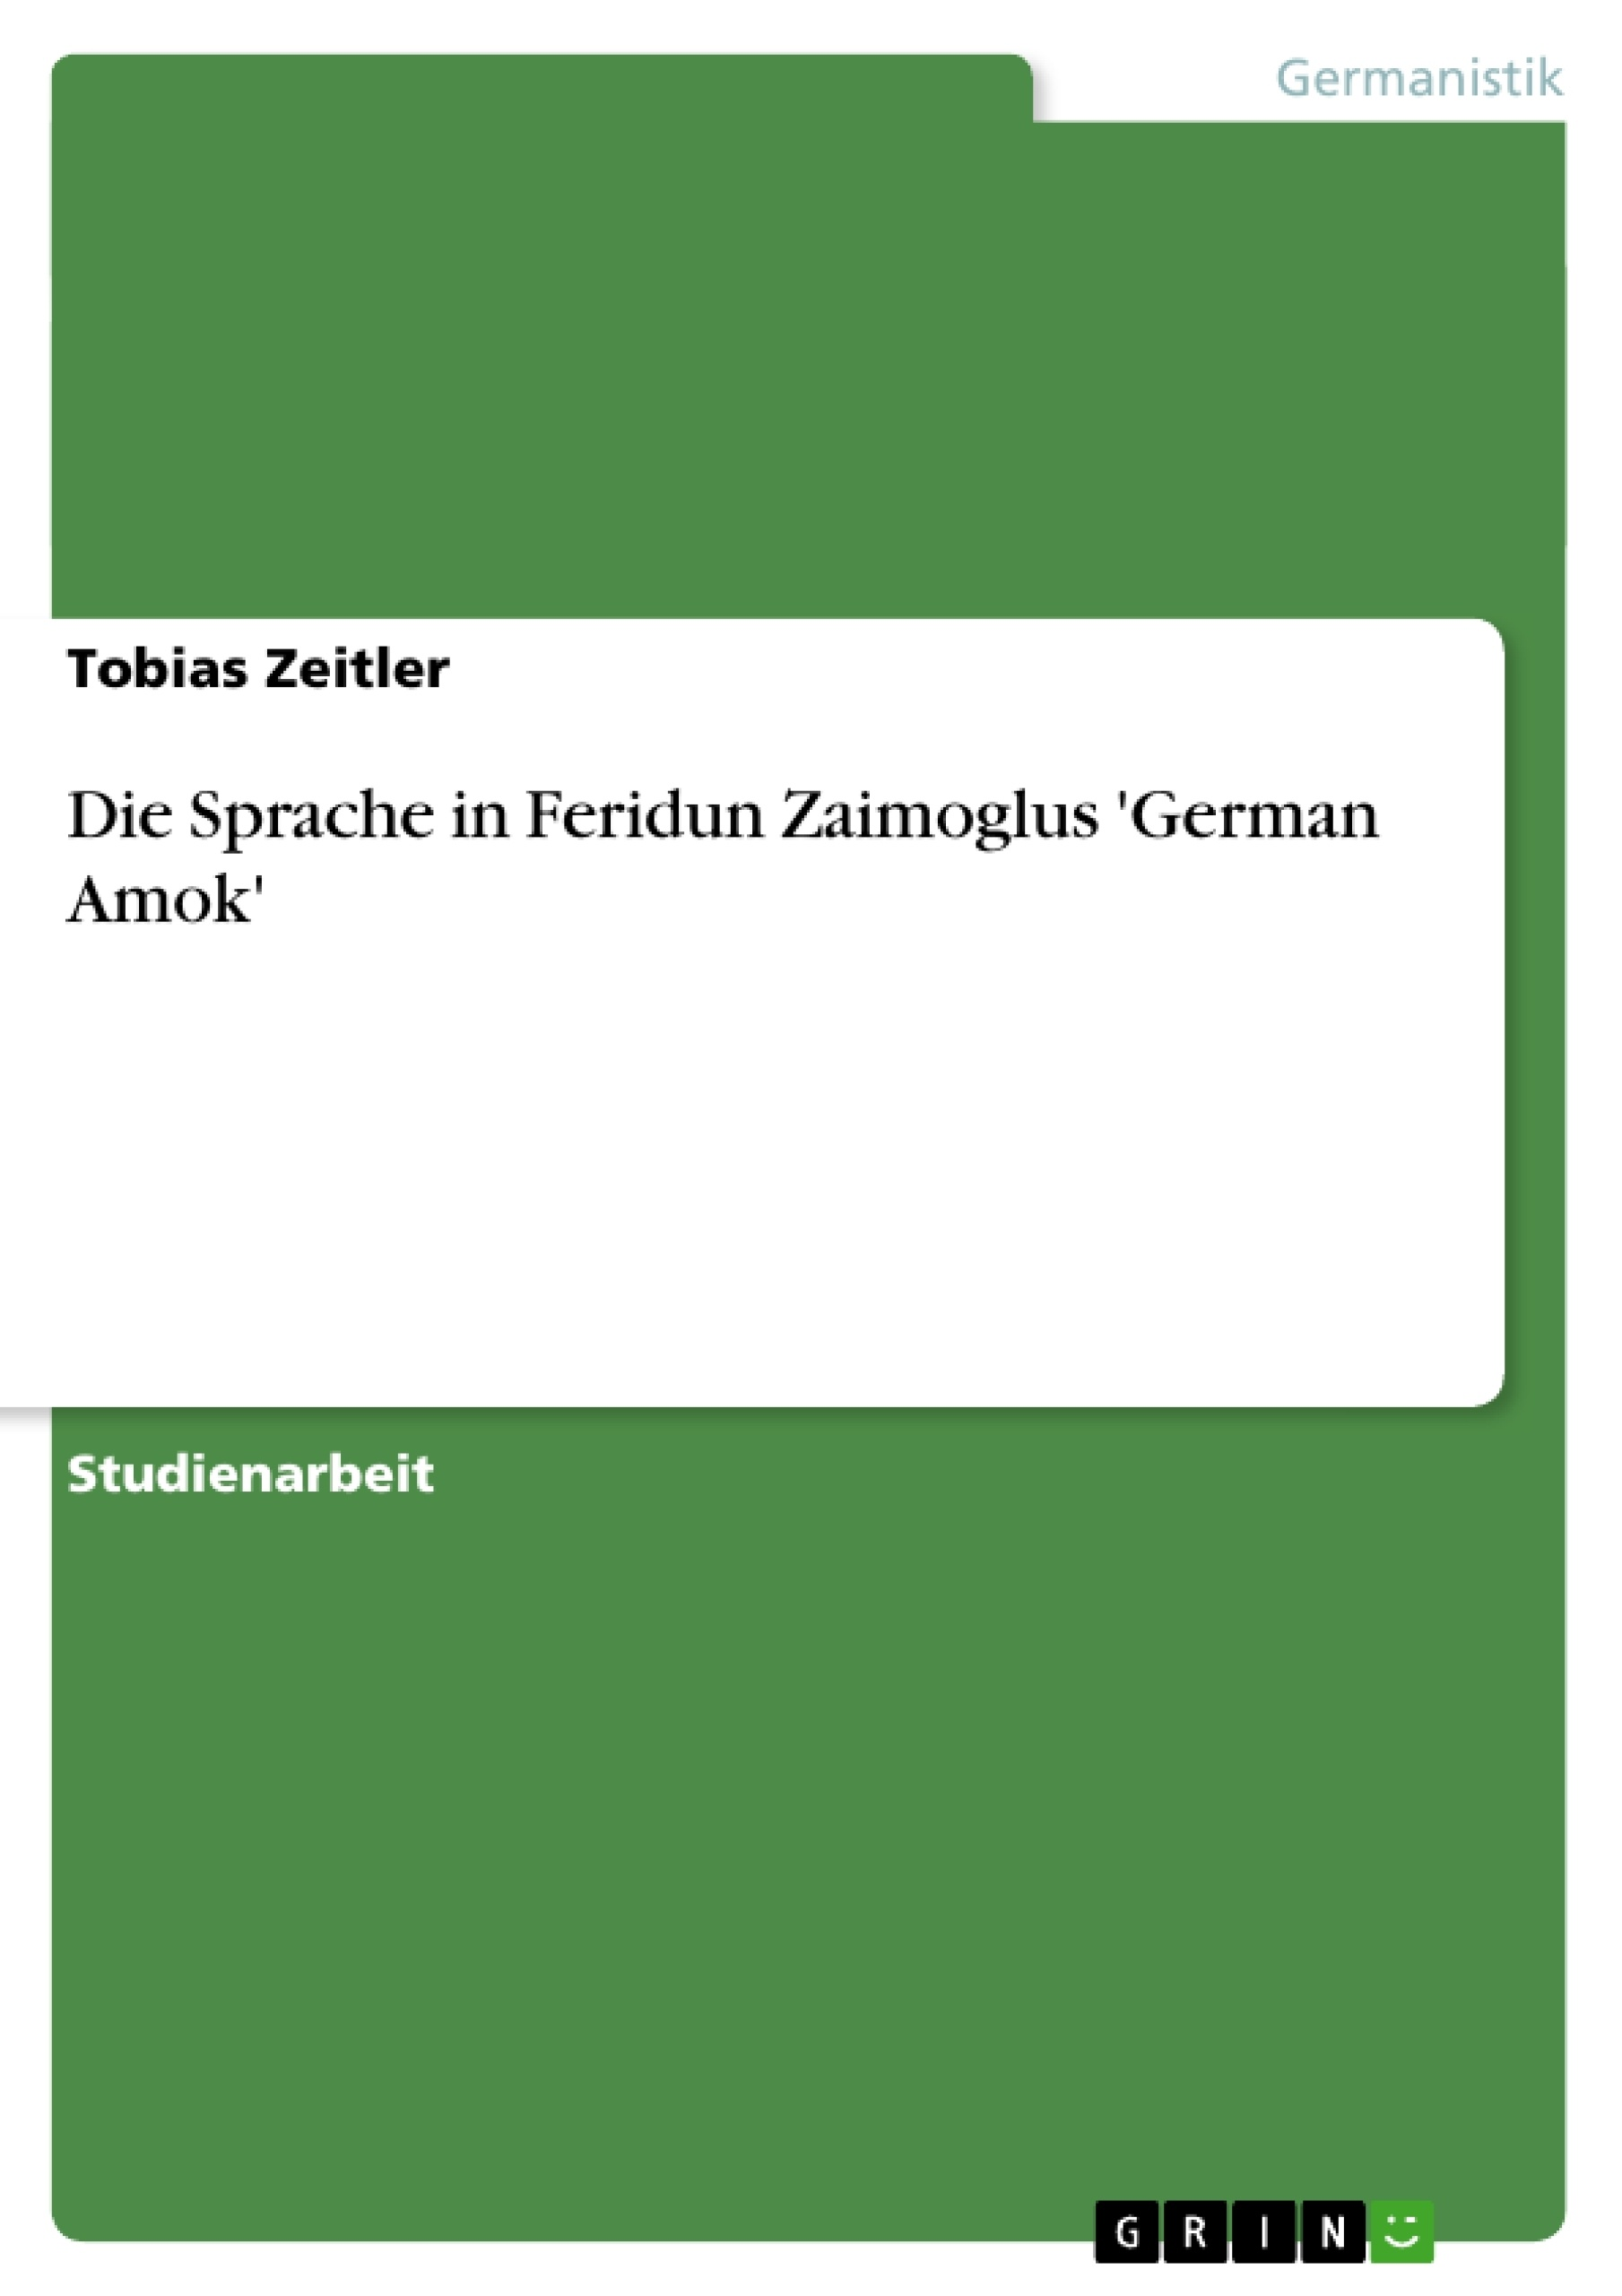 Titel: Die Sprache in Feridun Zaimoglus 'German Amok'